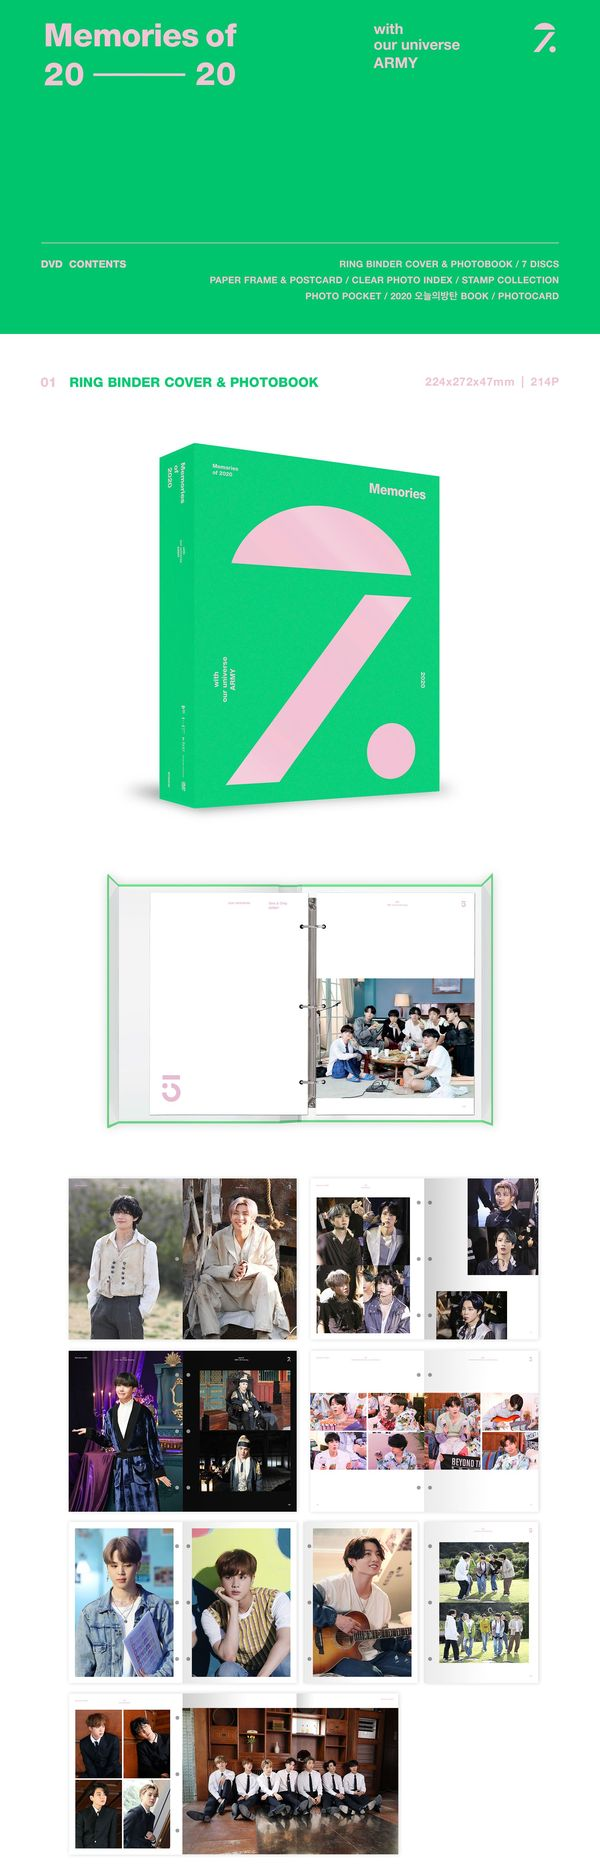 MEMORIES OF 2020 DVD - BTS - Musik - Big Hit Entertainment - 8809375122452 - August 13, 2021